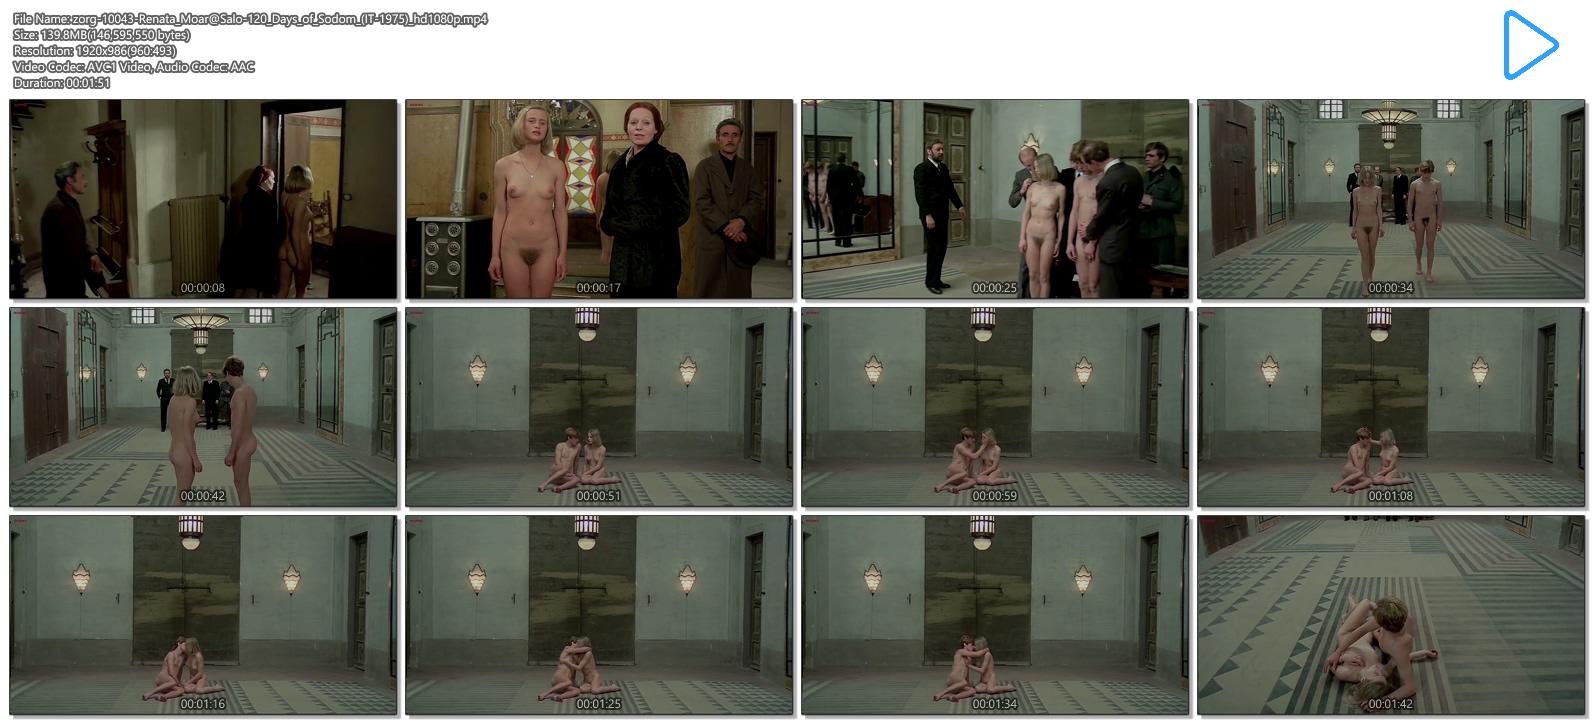 Renata Moar nude full frontal - Salo - 120 Days of Sodom (1975) hd1080p (7)